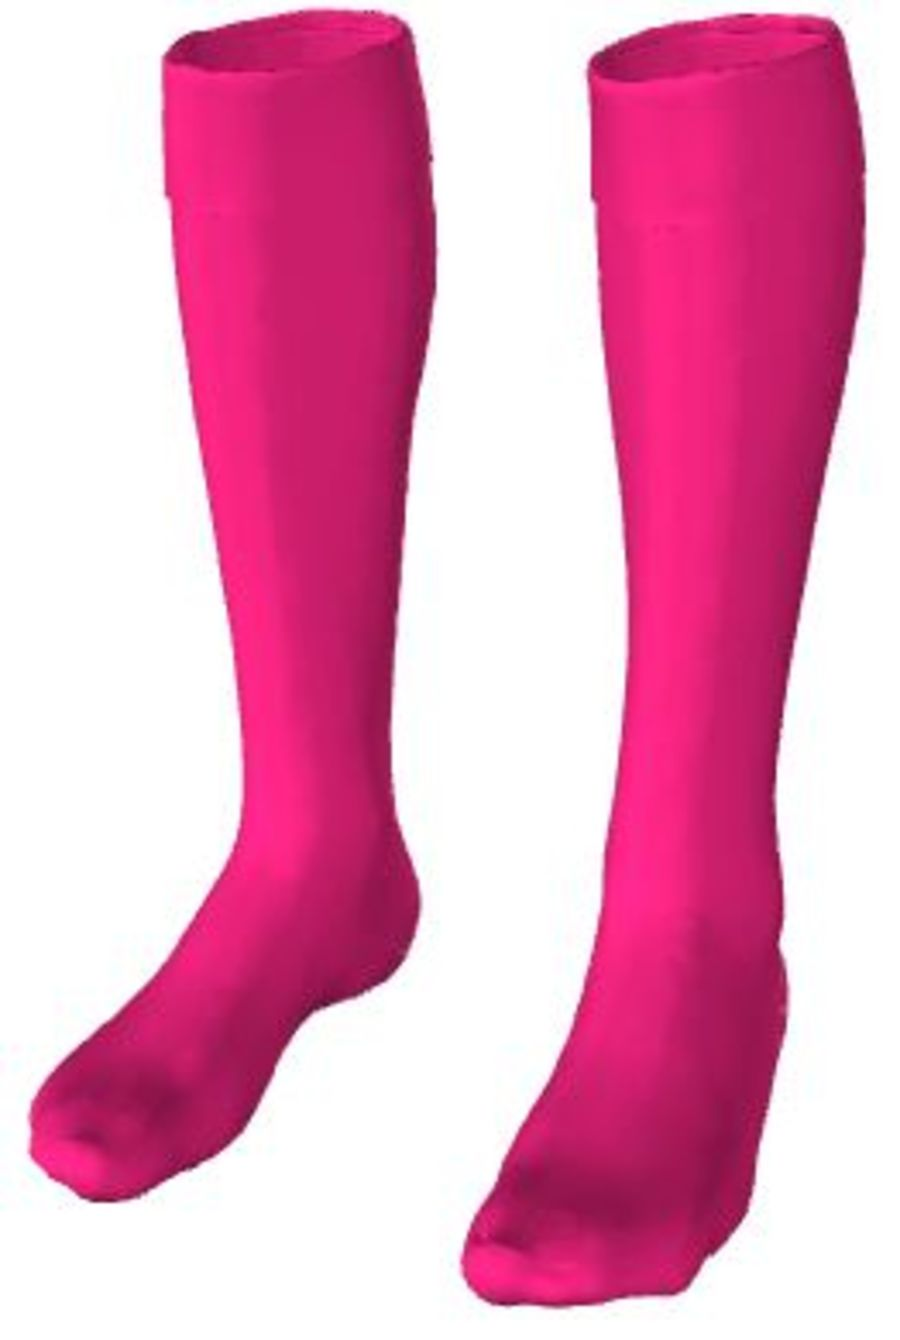 C4R. Halas Hawks Pink GK Sock - Adult